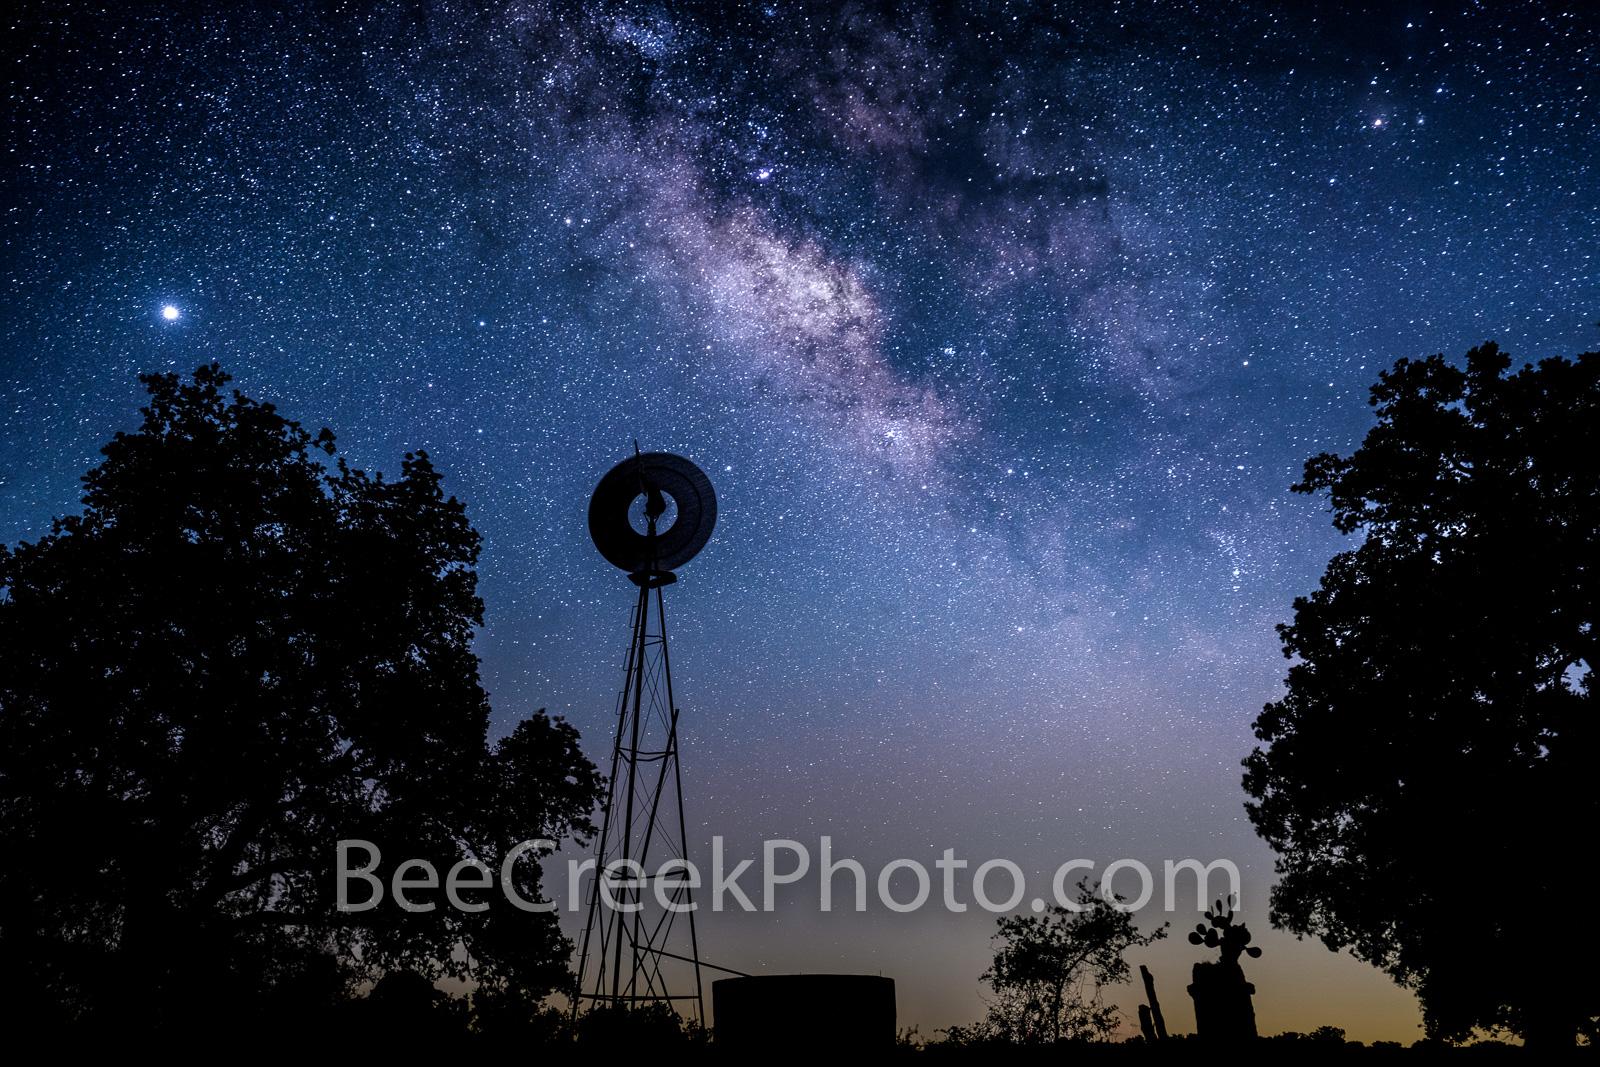 texas, windmill, water tank, prickly pear cactus, silouette, milky way, night sky, stars, galaxy, texas hill country, celestial, starry night, night, dark sky, dark skies, star, starscapes, venus, , photo